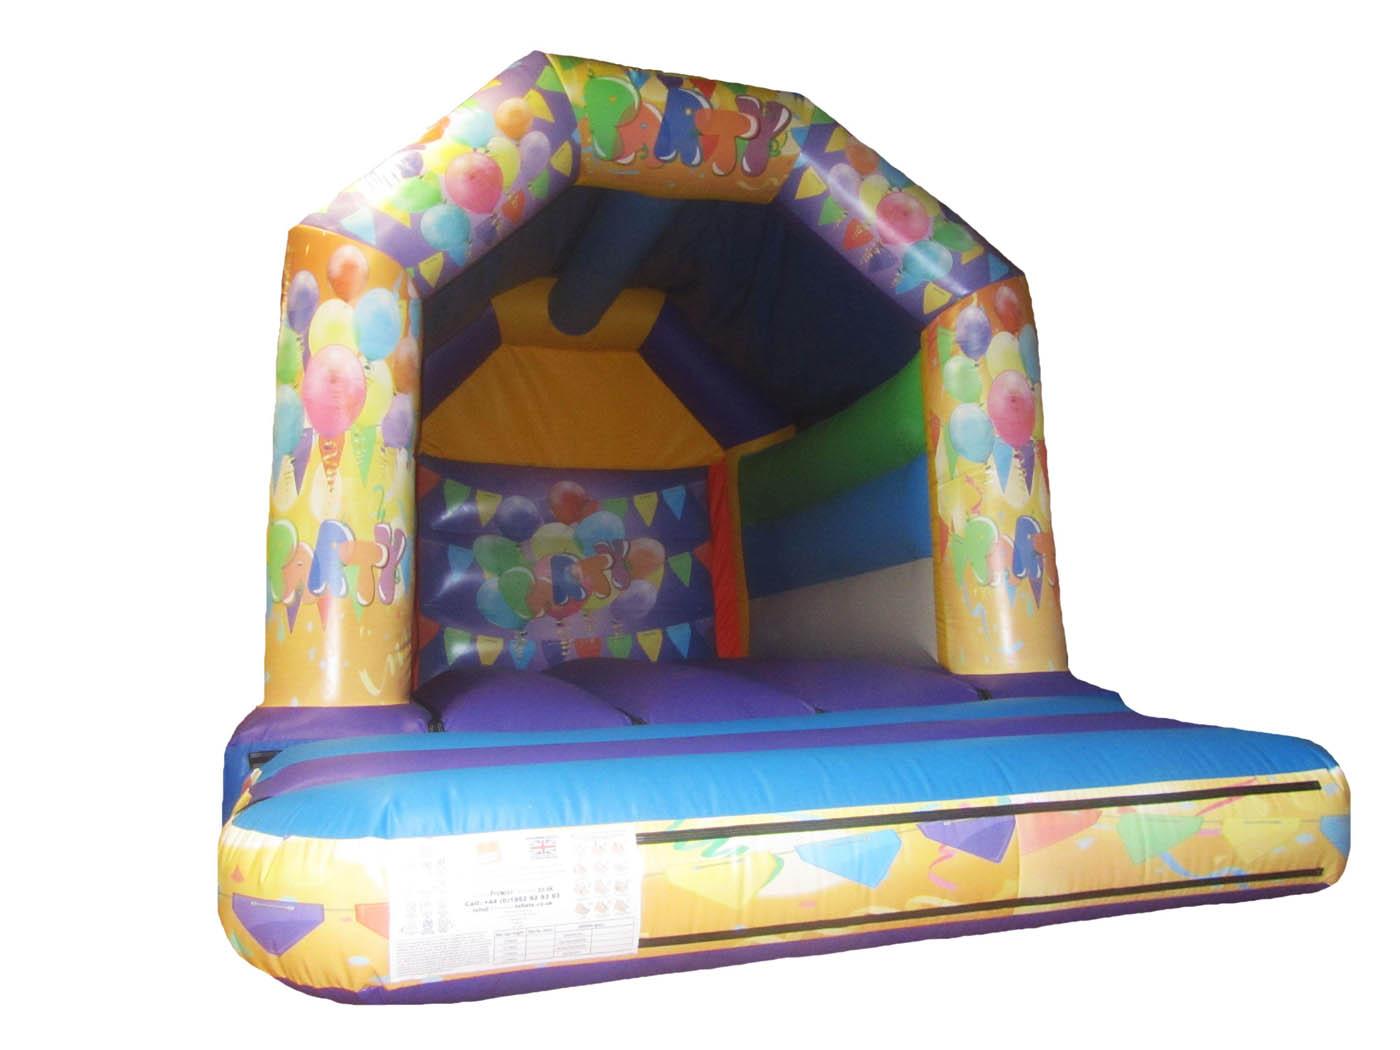 15x11-orange-purple-printed-party-inflatable-bouncy-castle-compressor